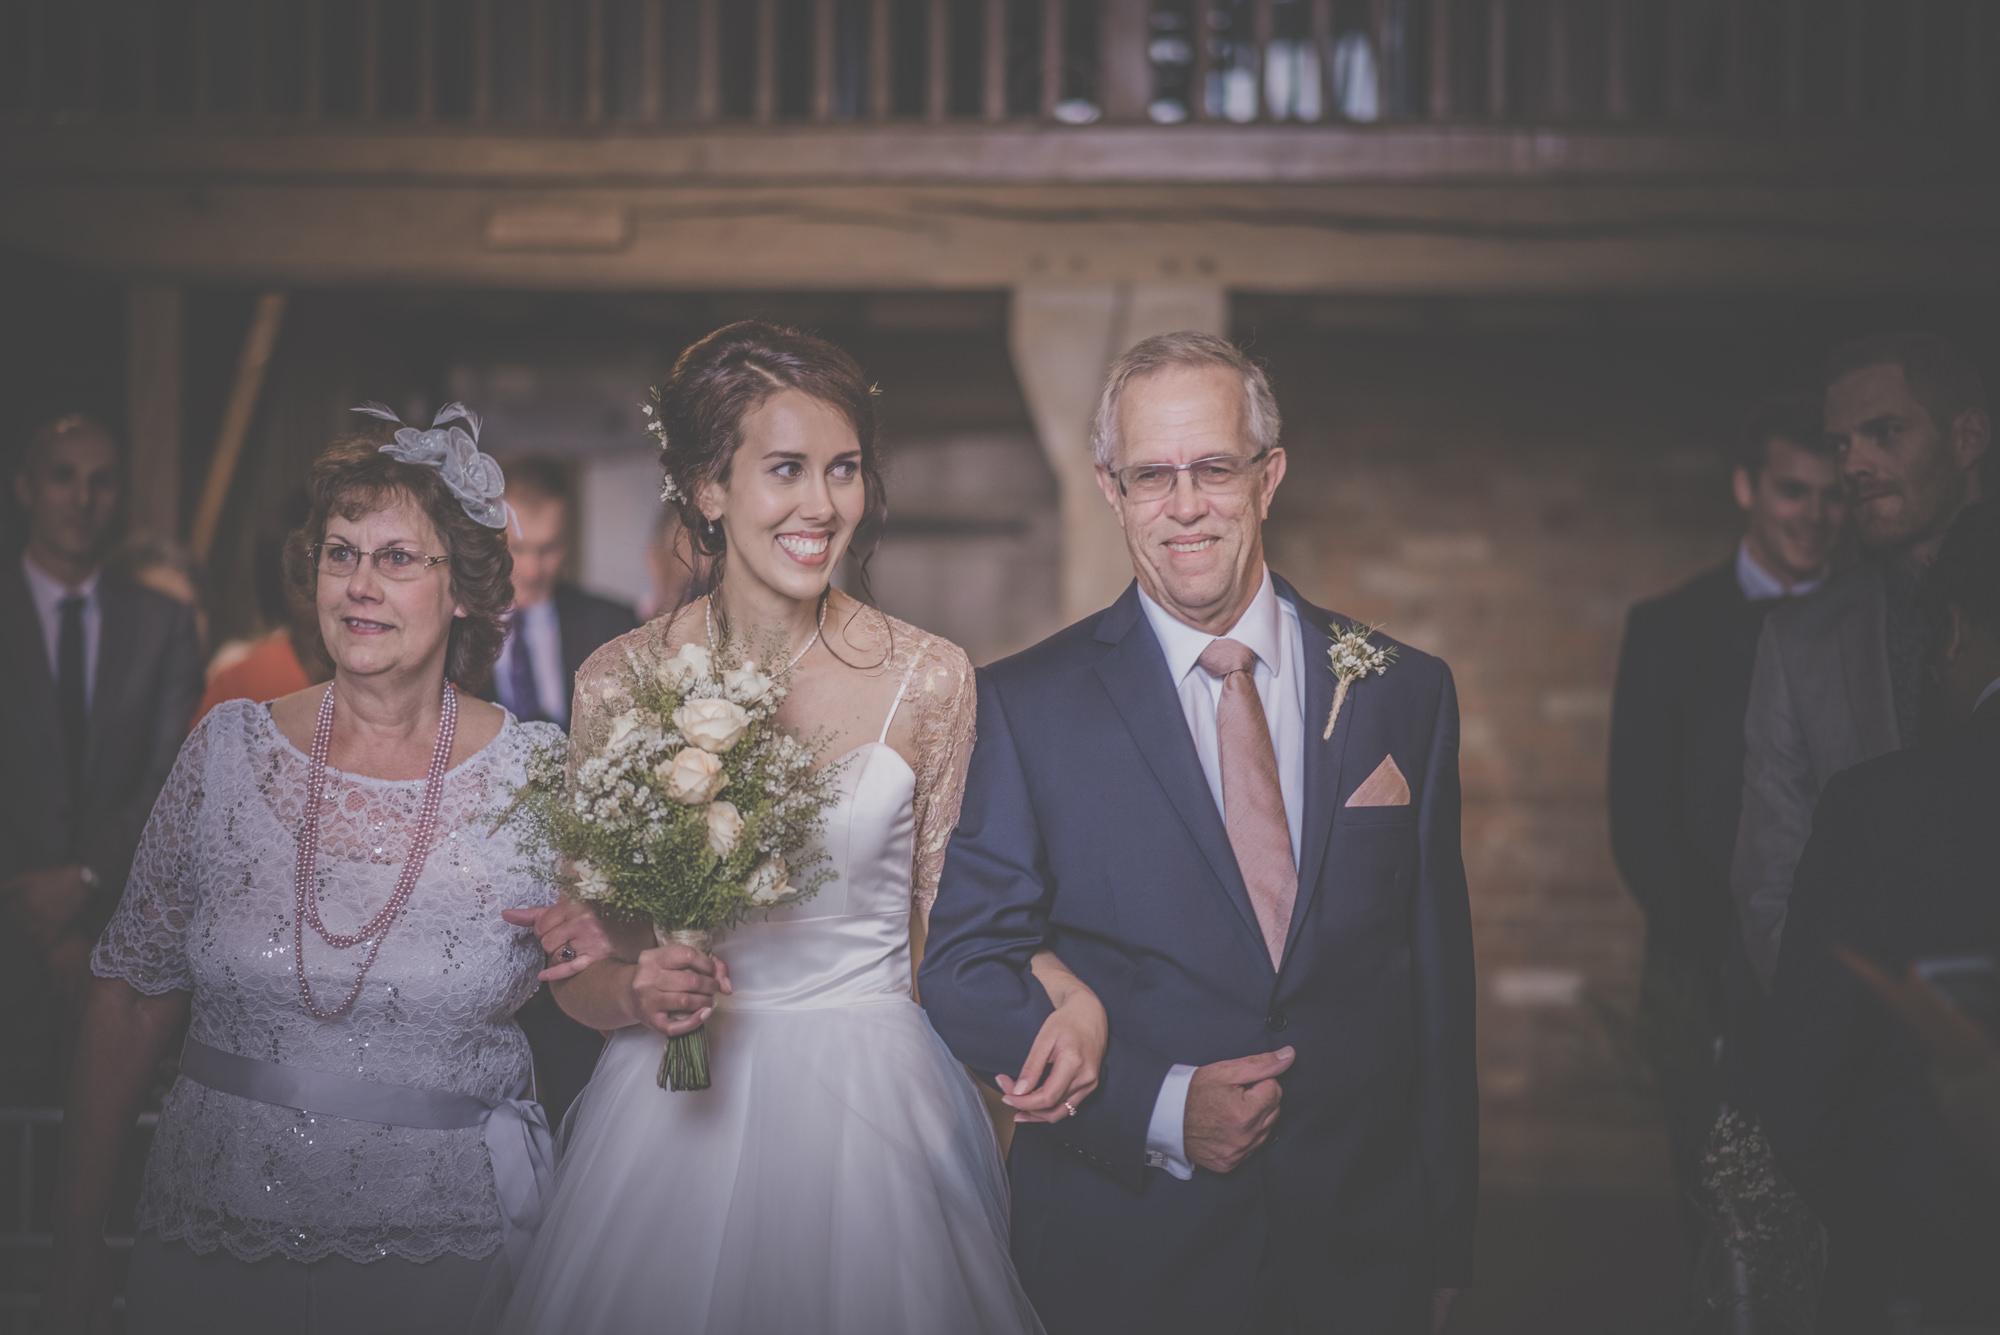 Charisse-and-James-wedding-in-Cain-Manor-Venue-Hampshire-Manu-Mendoza-Wedding-Photography-205.jpg